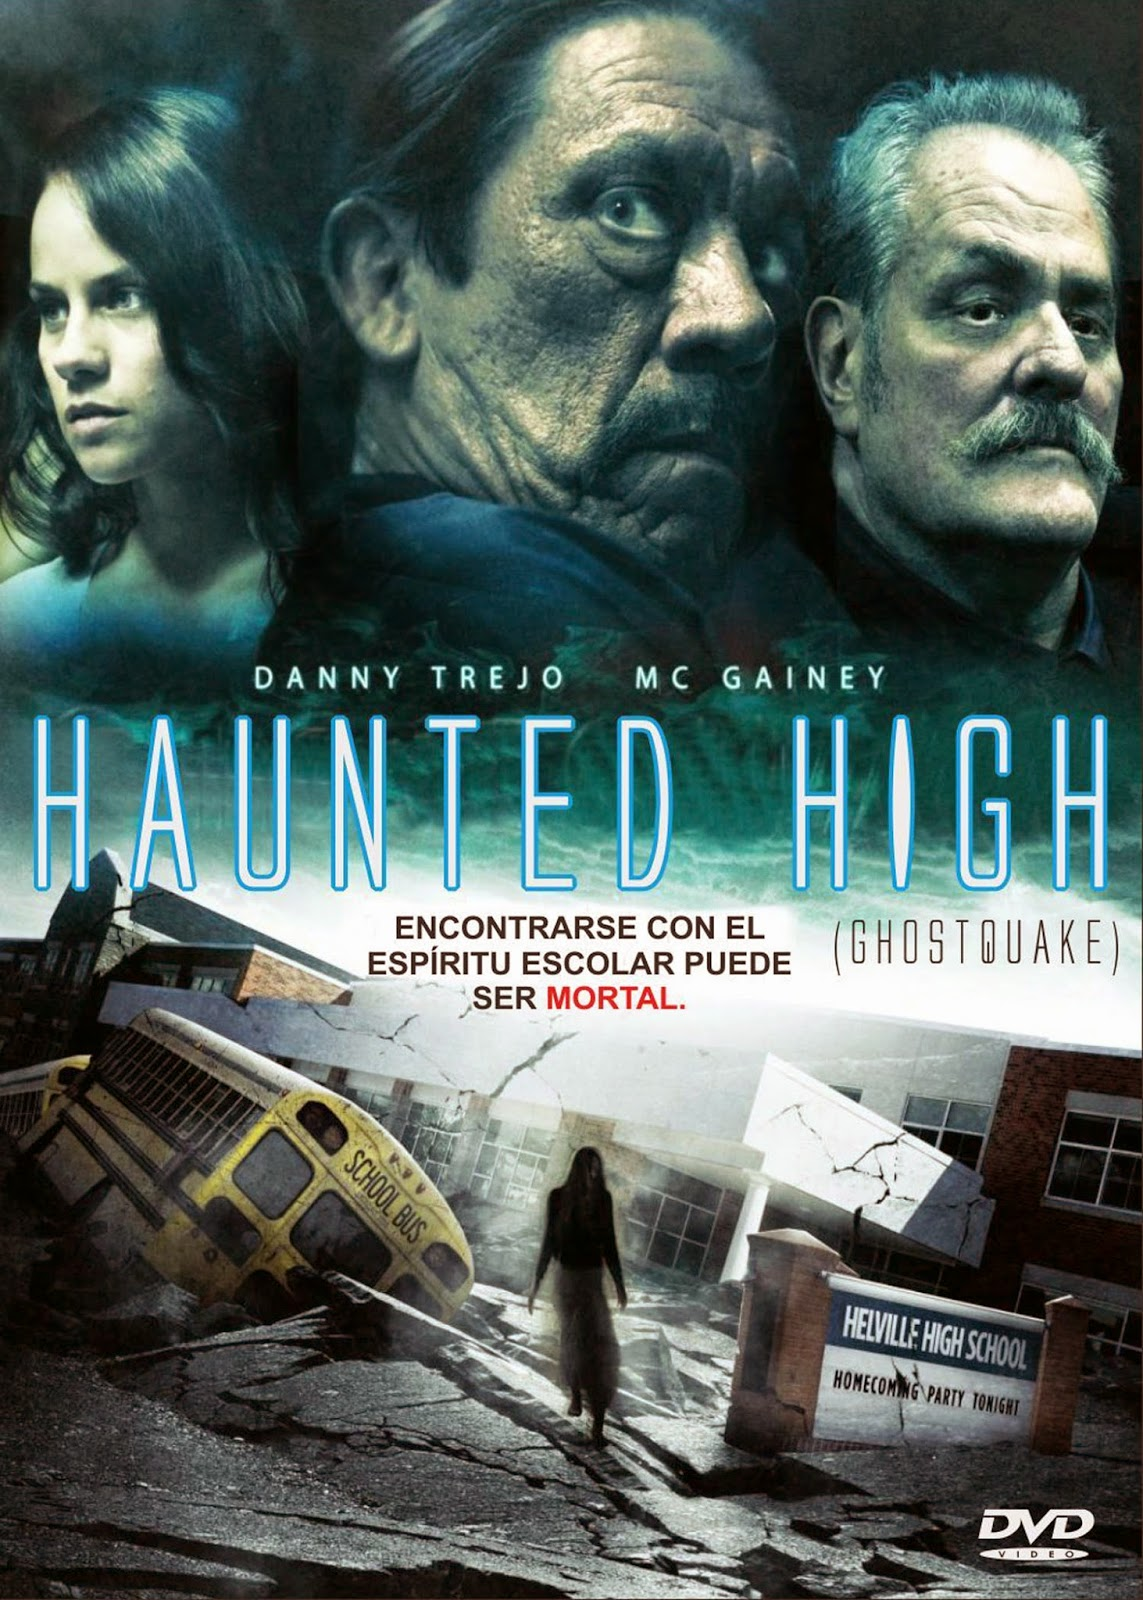 Haunted High - Ghostquake (2012)